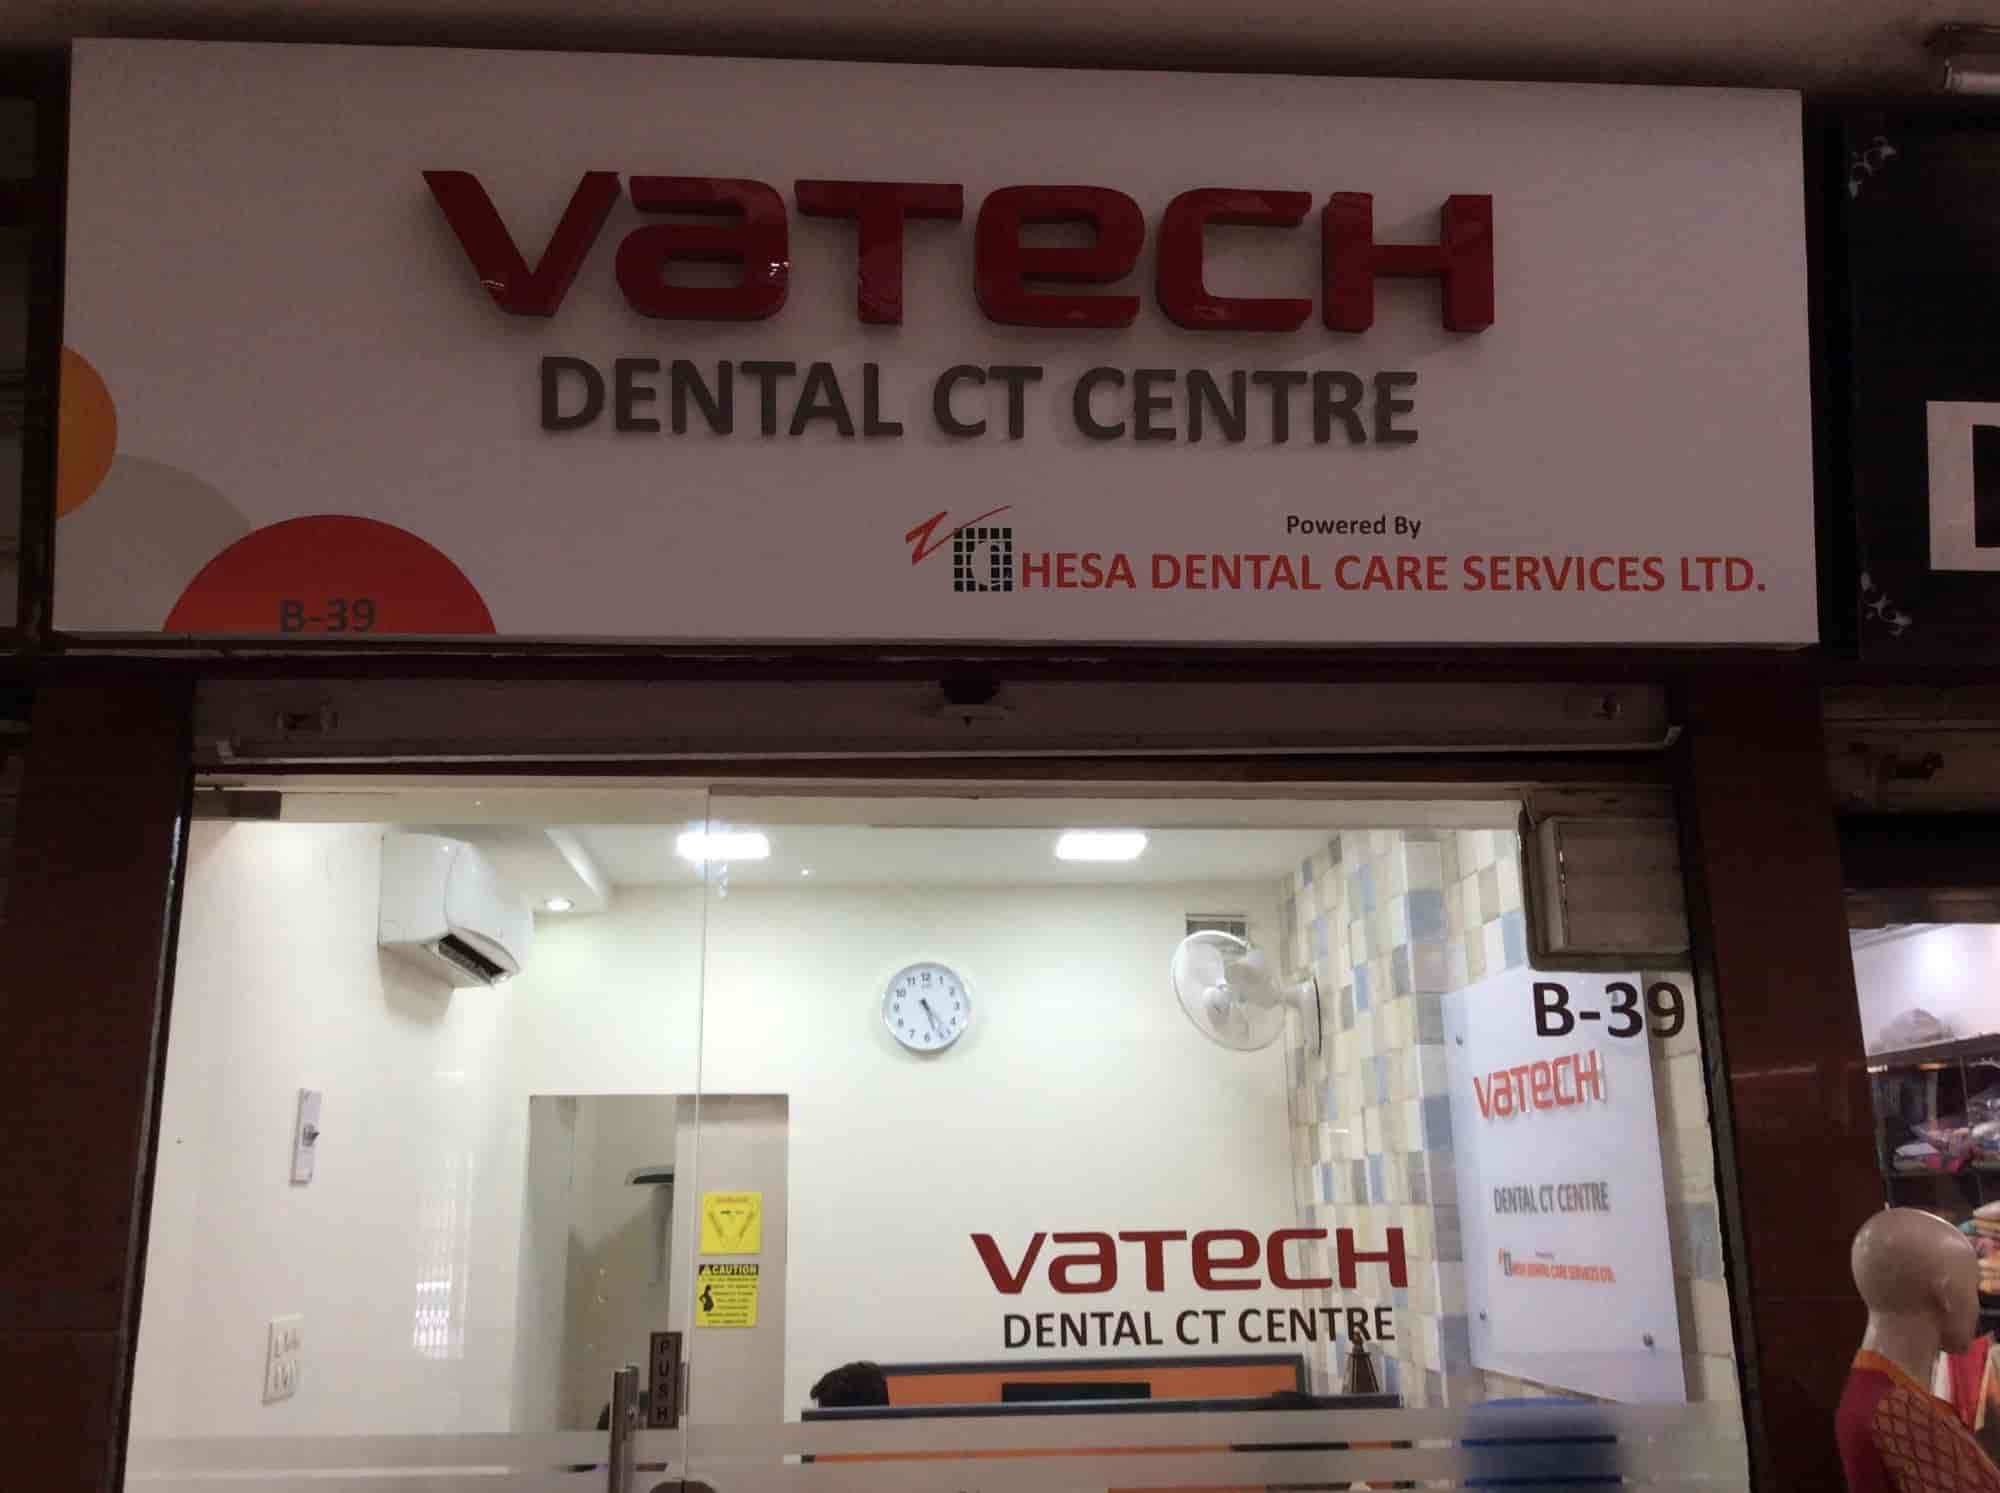 Vatech Dental CT Centre Photos, Rohini Sector 9, Delhi